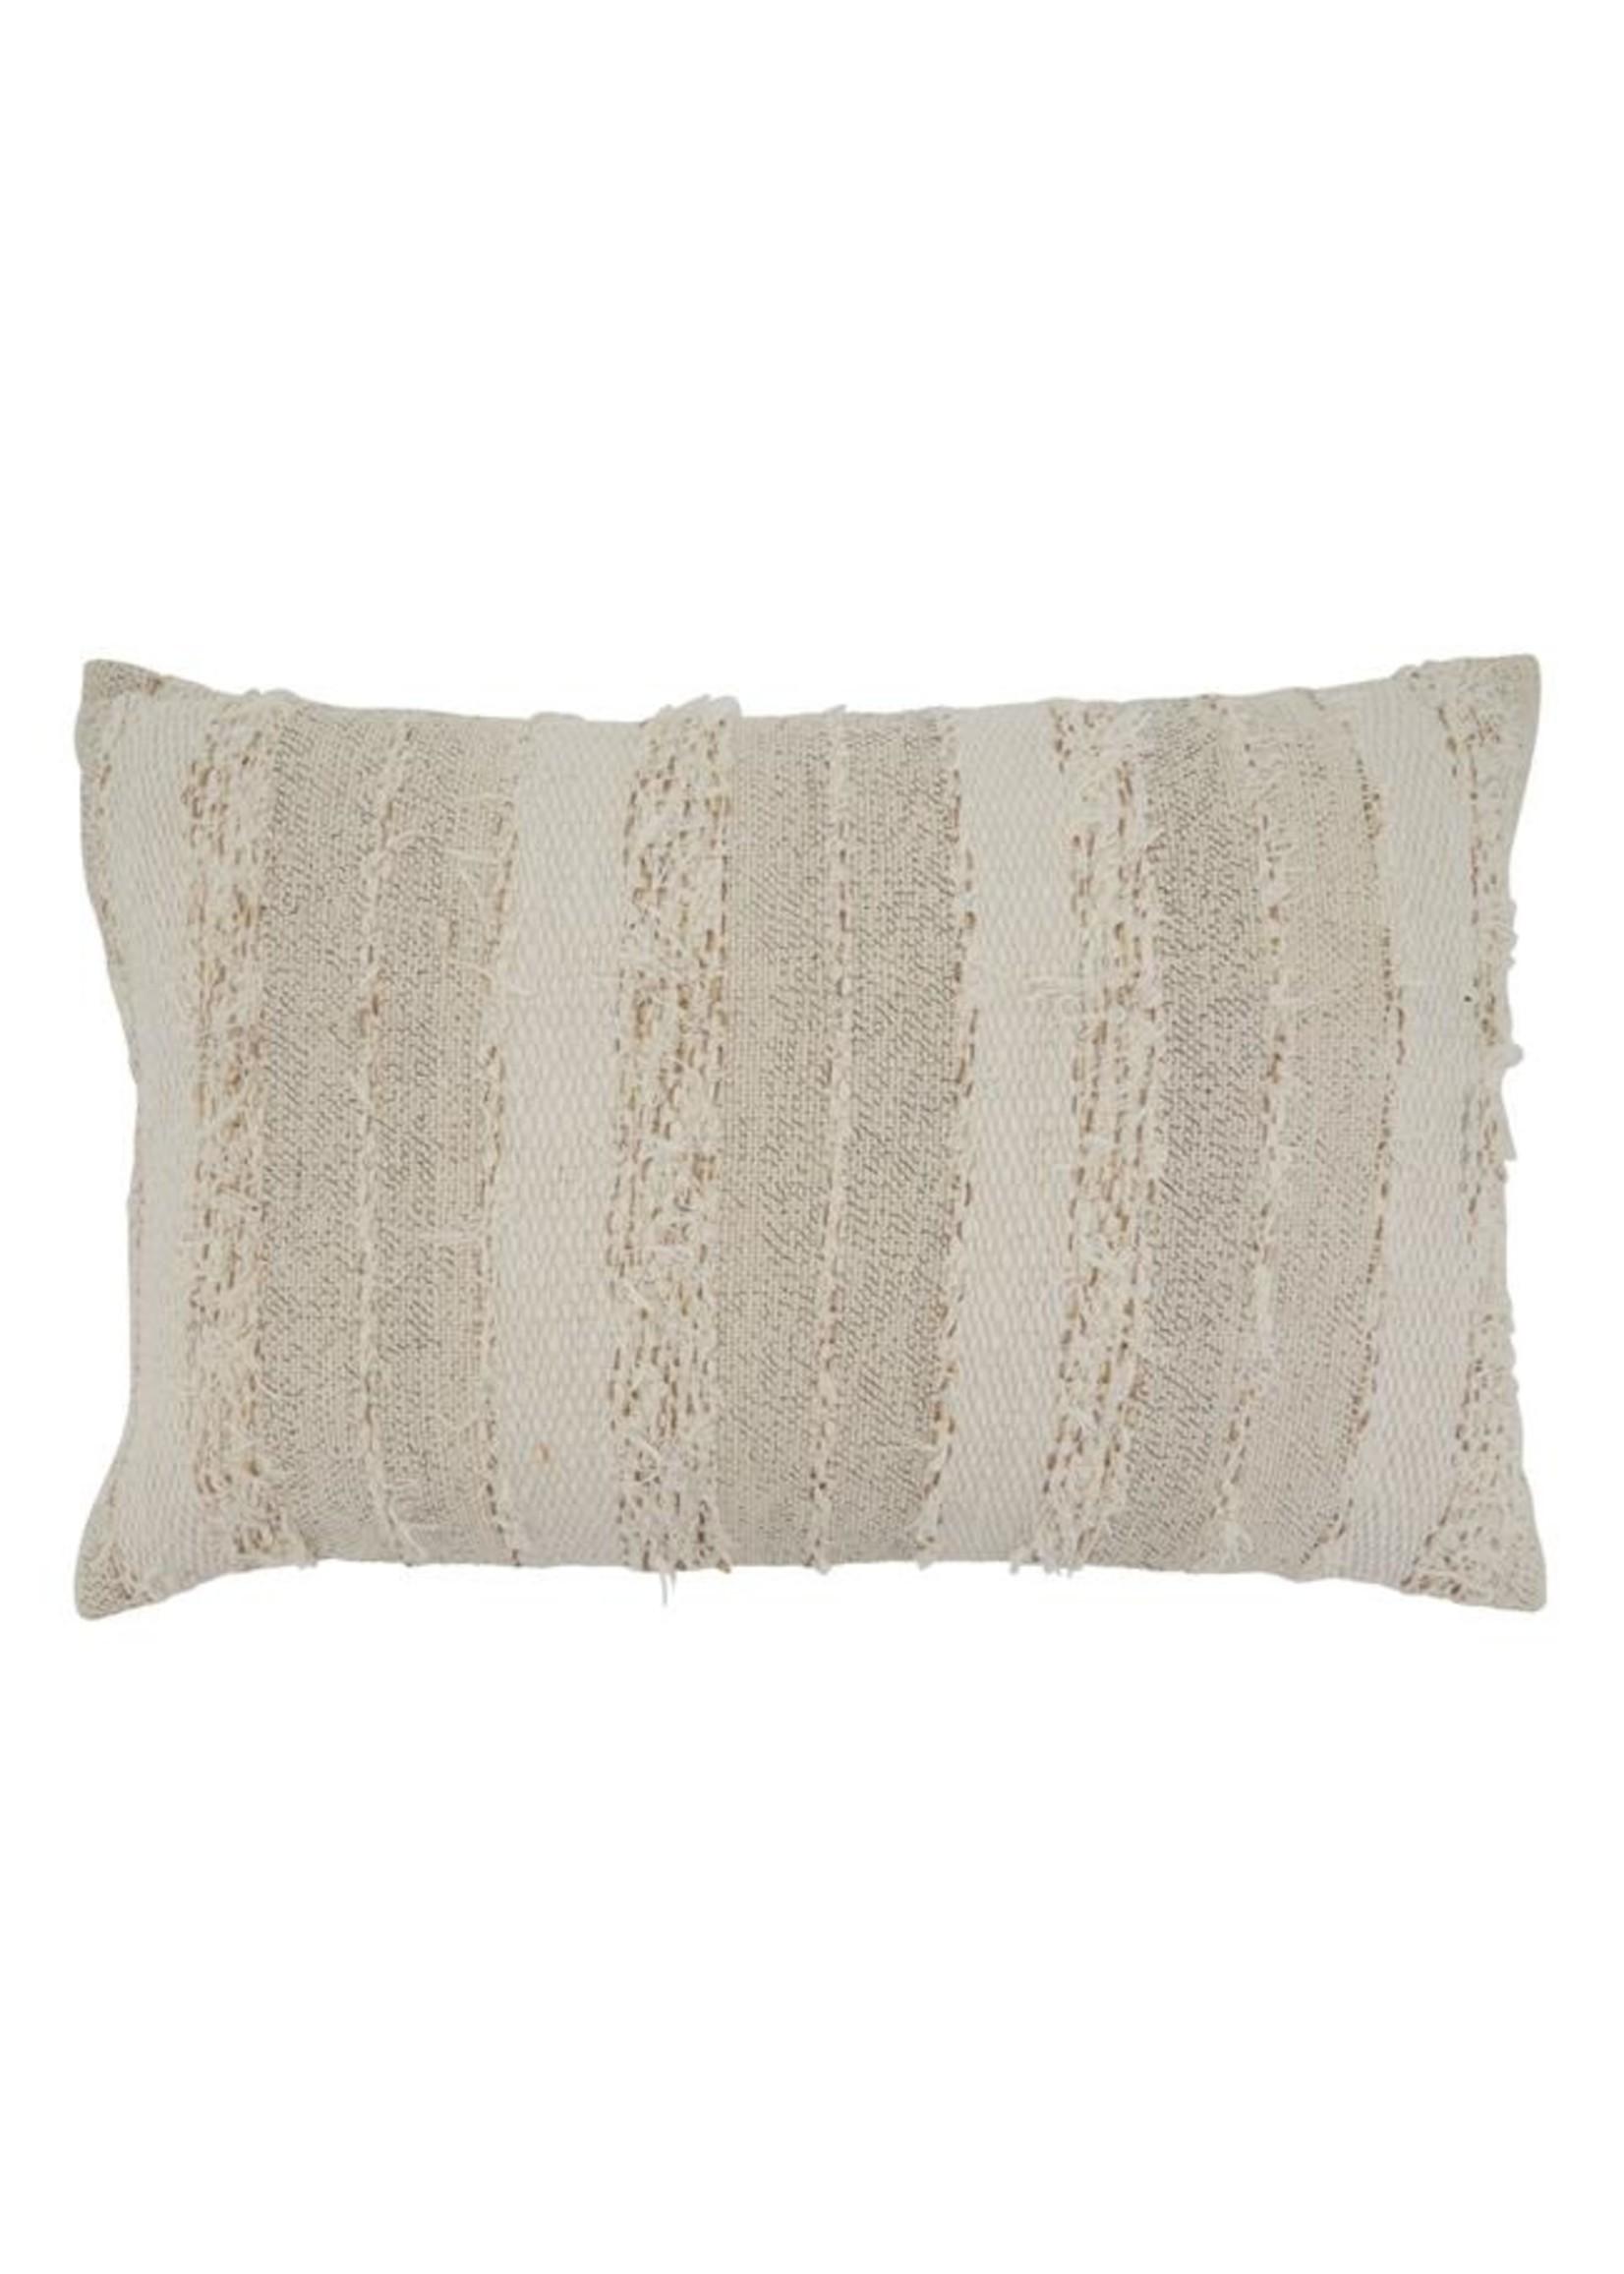 Saro Fringe Stripe Pillow - Ivory